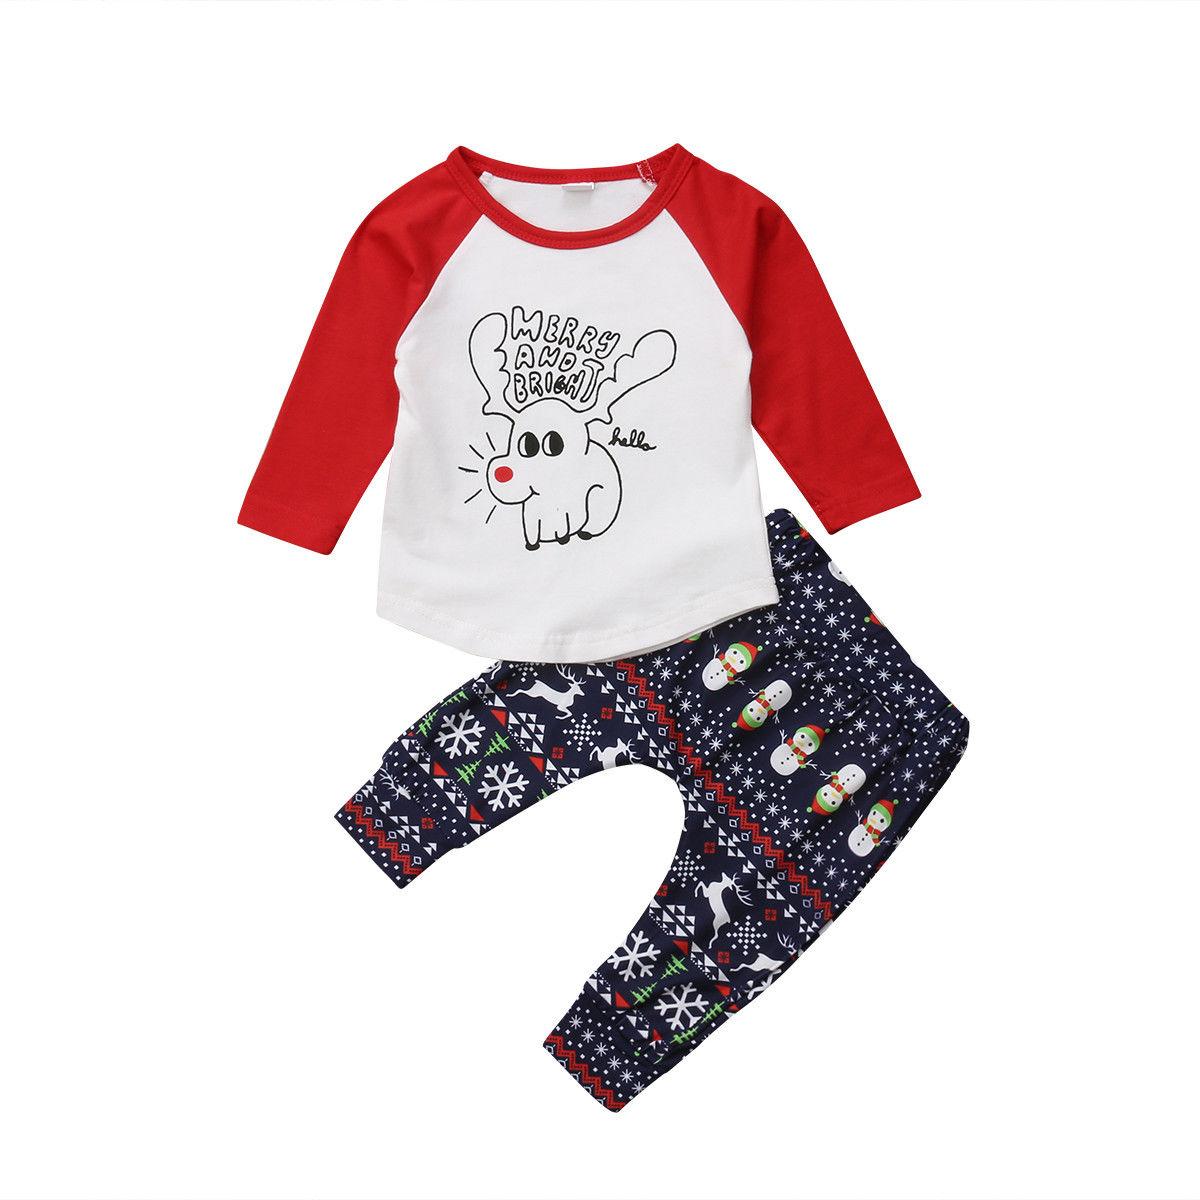 Christmas Cute Newborn Infant Baby Boy Girl Clothes T ...